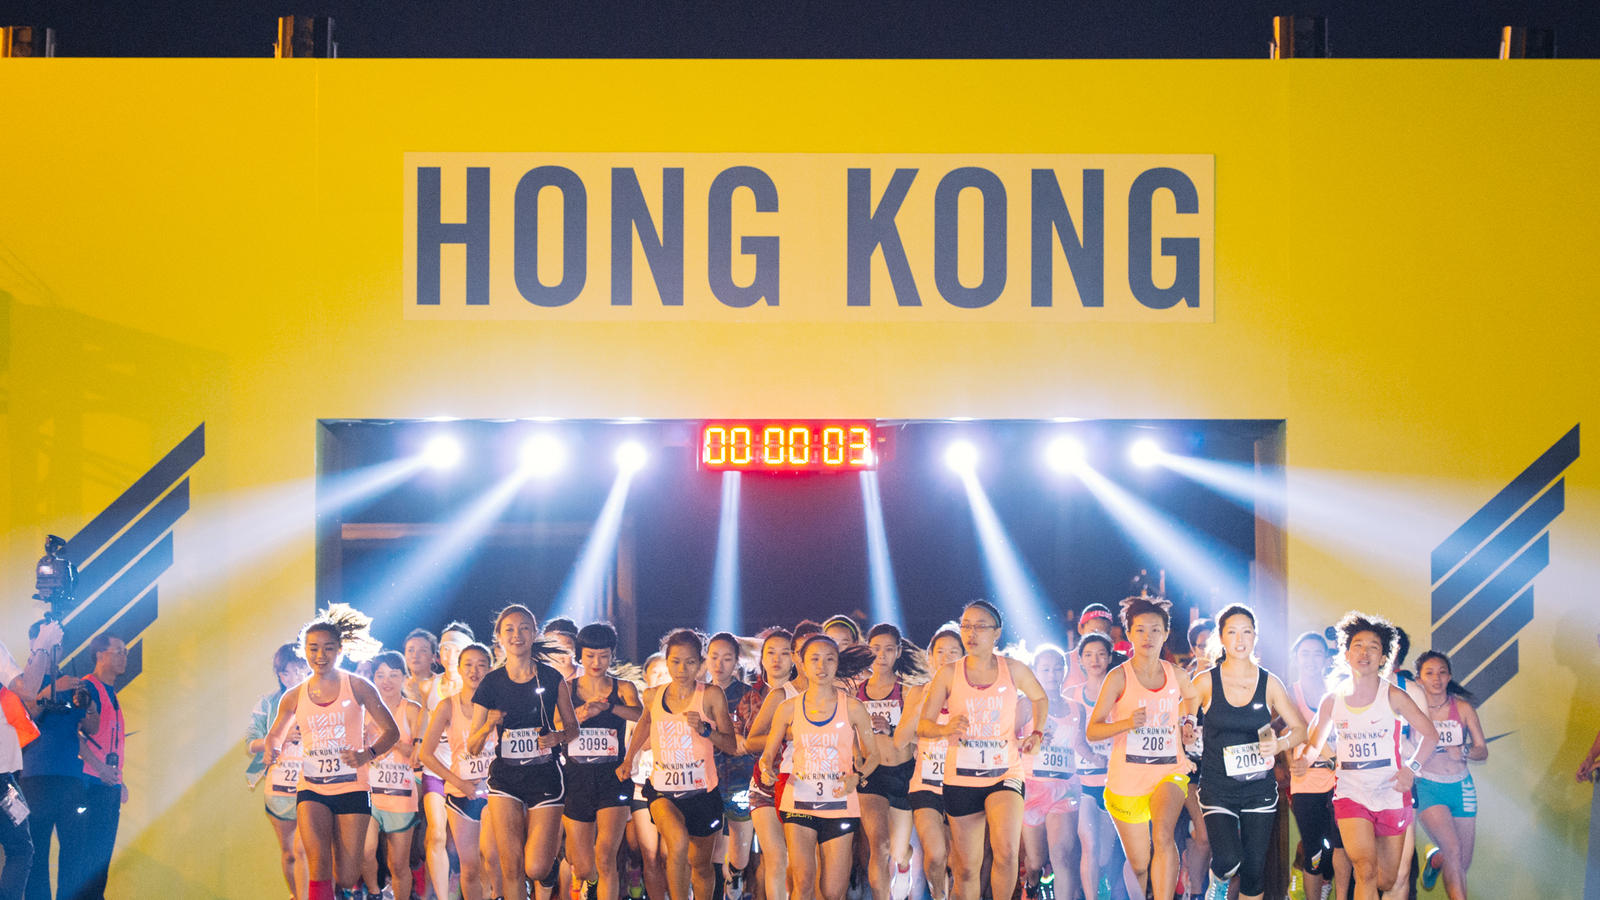 Nw Hong Kong 2015 Origina Porto